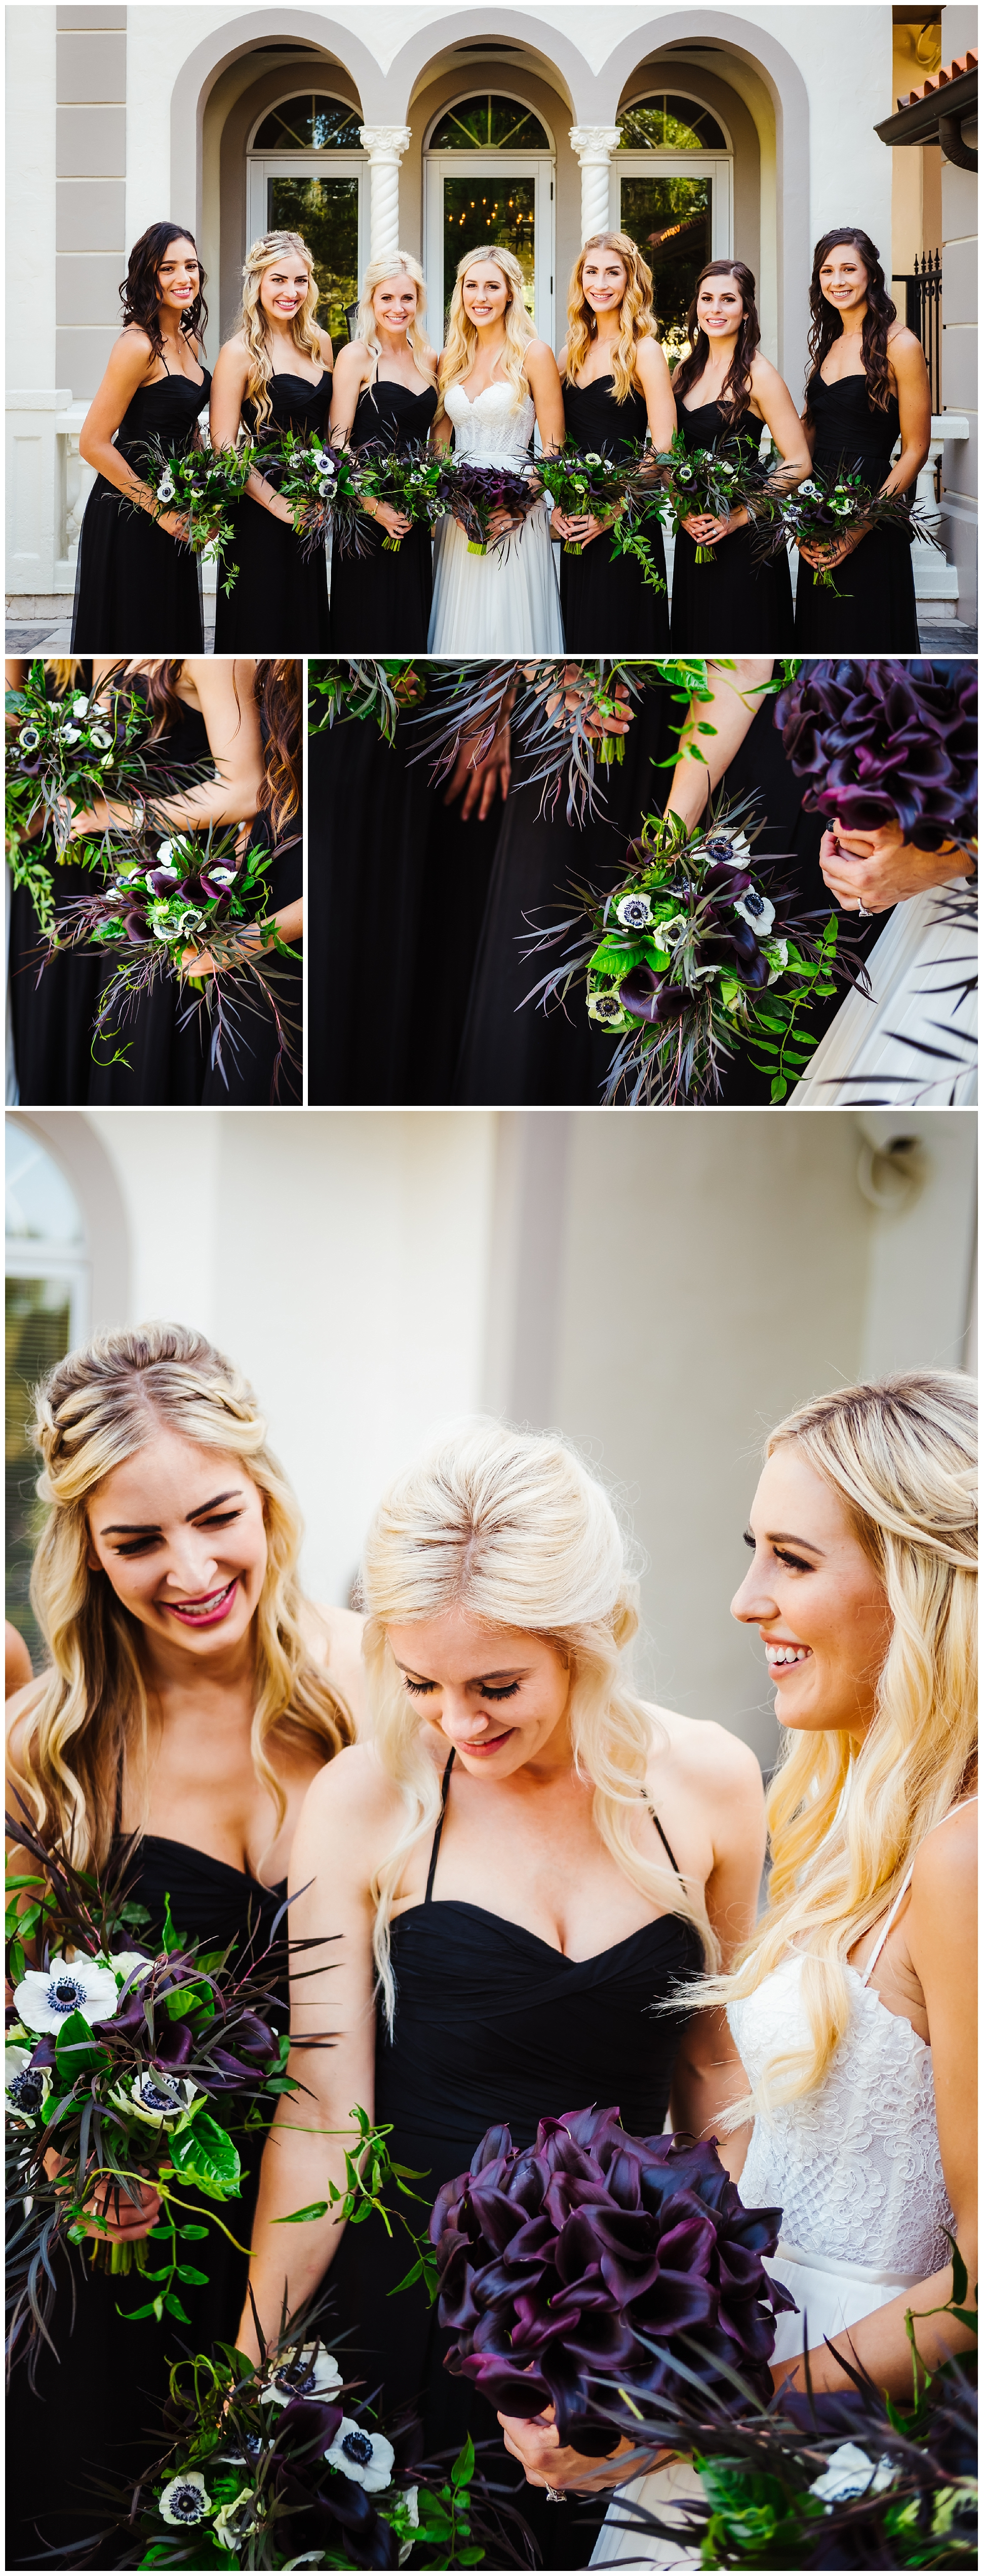 st-pete-wedding-photographer-backyard-luxury-snell-isle-vinoy_0017.jpg